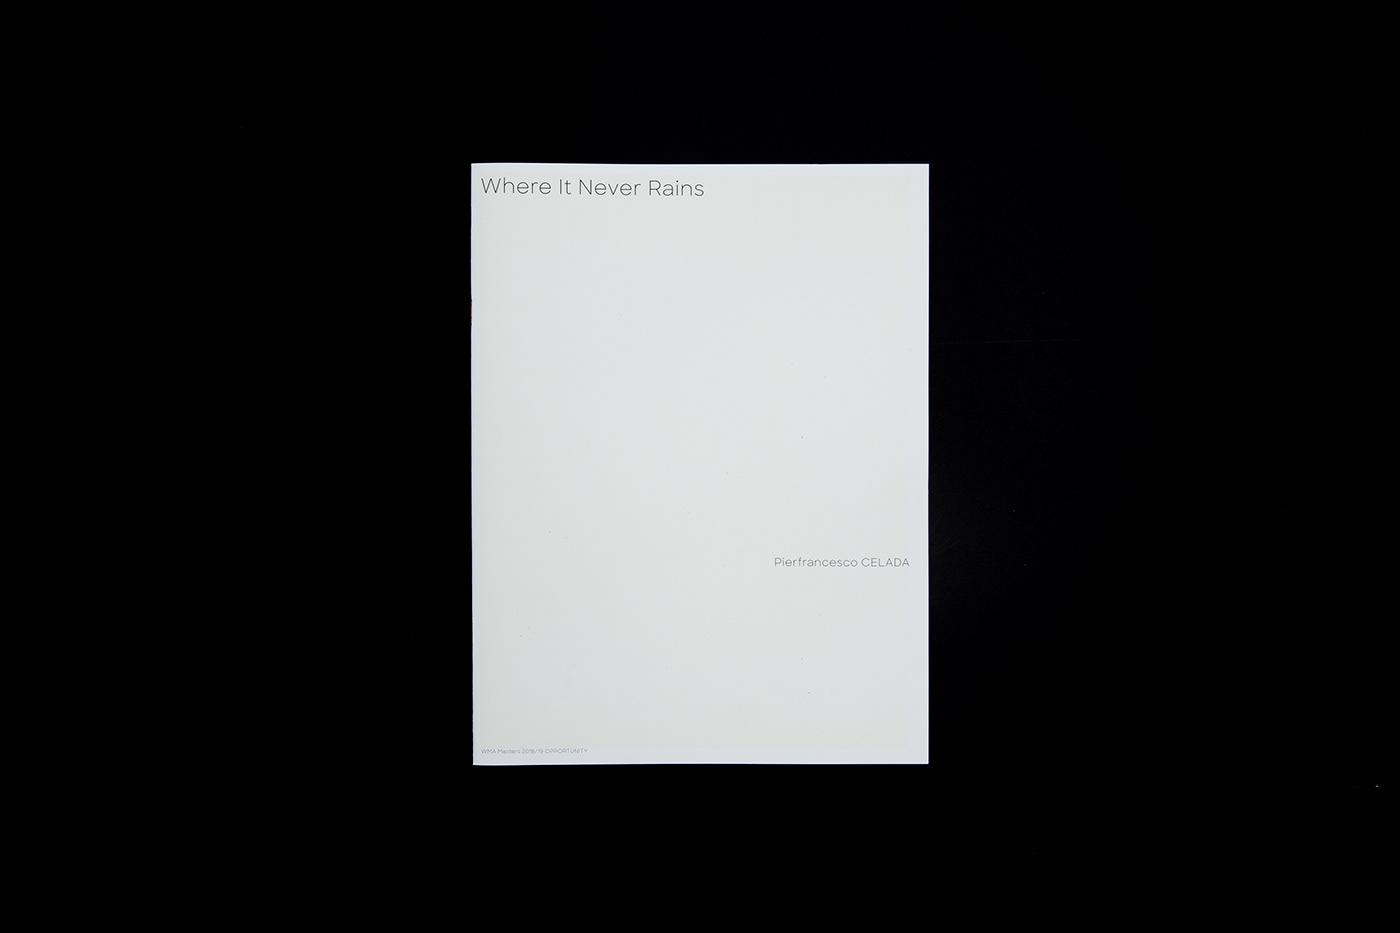 art binding book Bookwork EXHIBITION ON PAPER hongkong opportunity photobook publication social